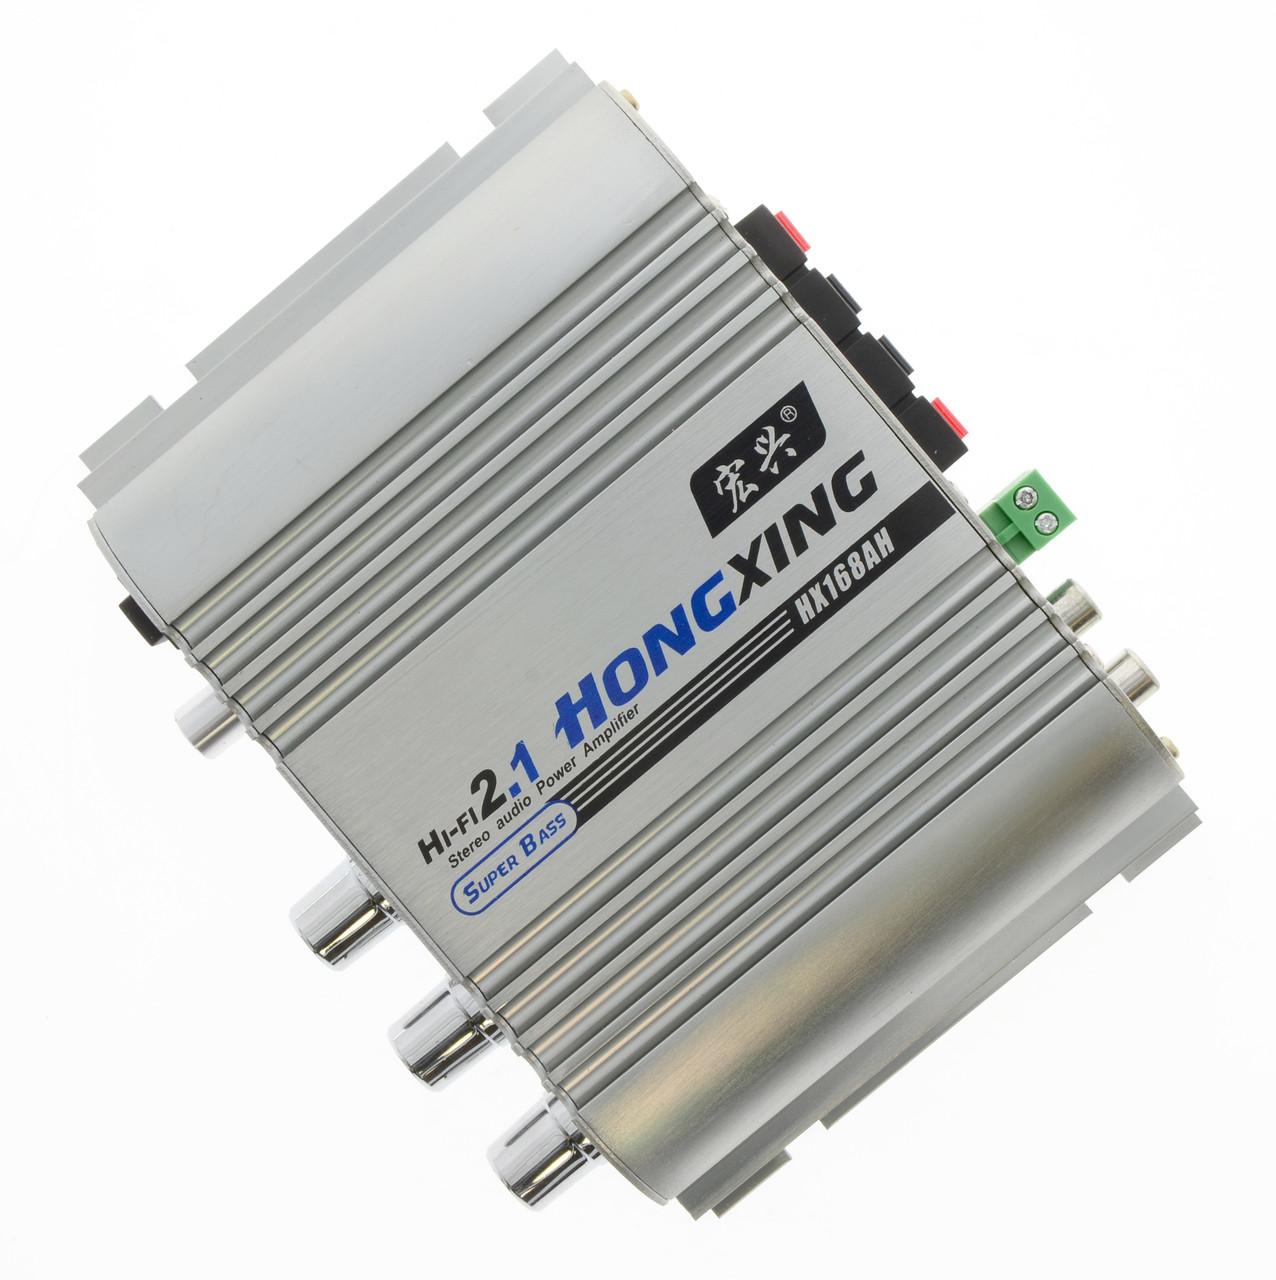 Audio Amplifier for Speed of Light (EA1588)